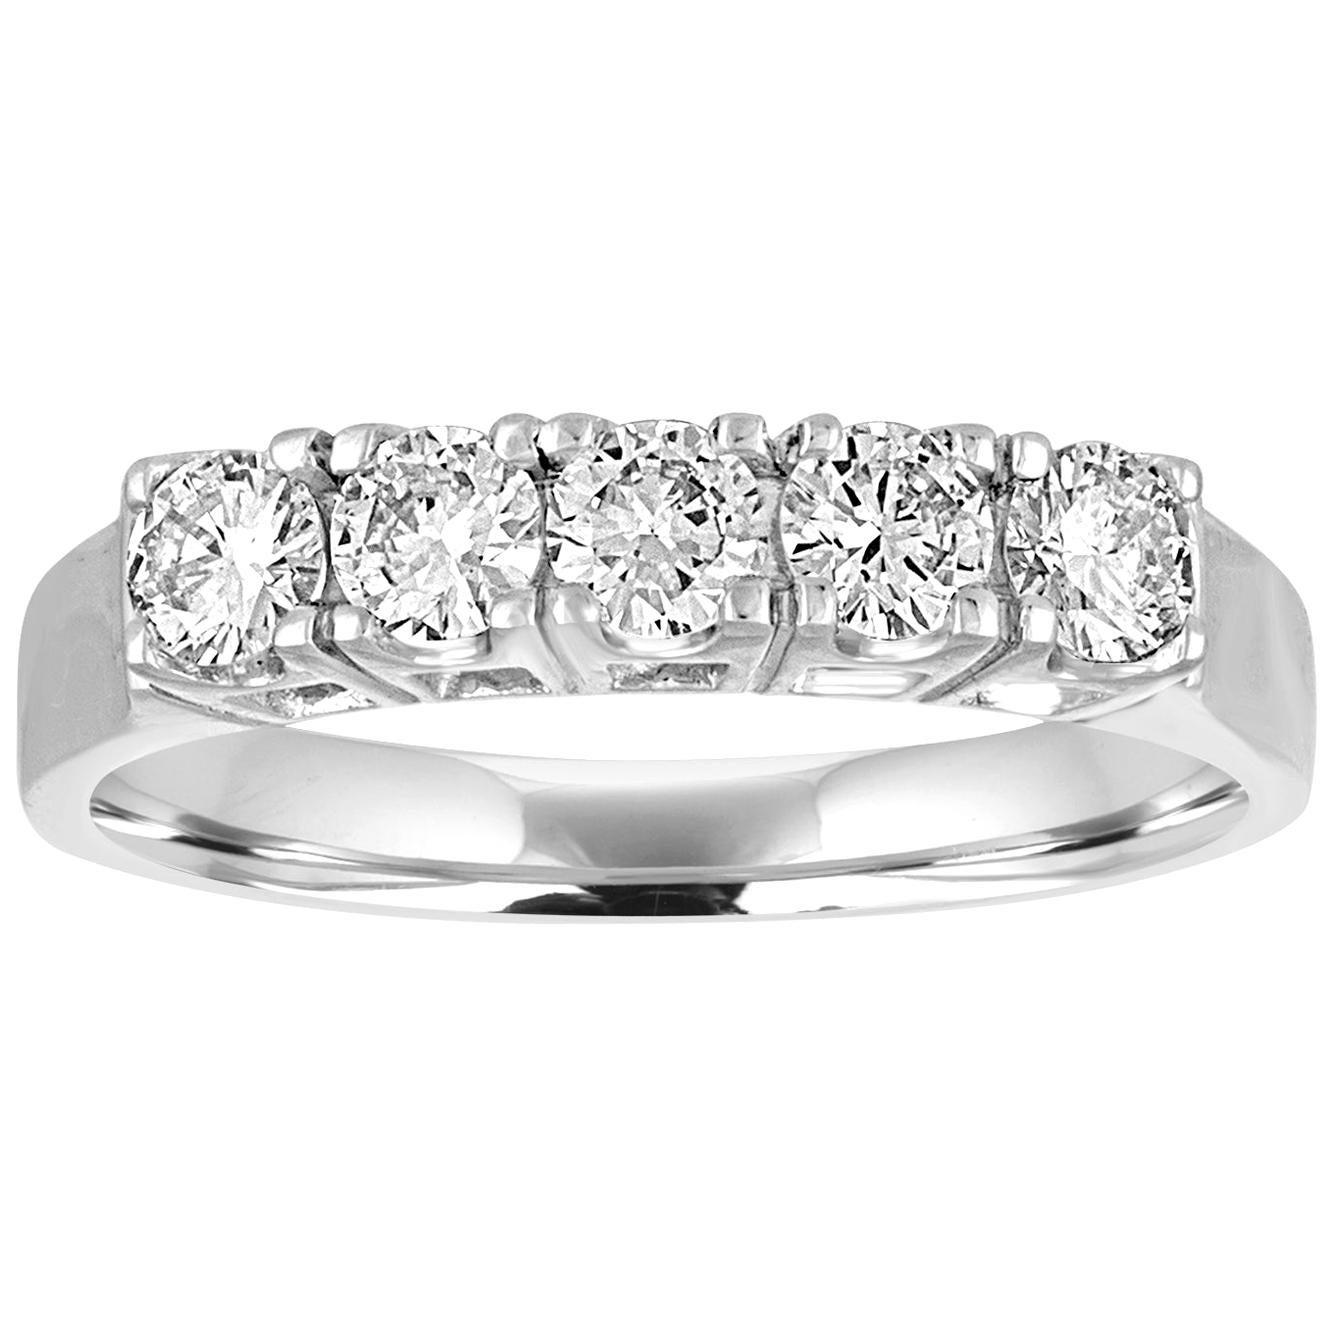 0.57 Carat Diamond Five-Stone Gold Half Band Ring